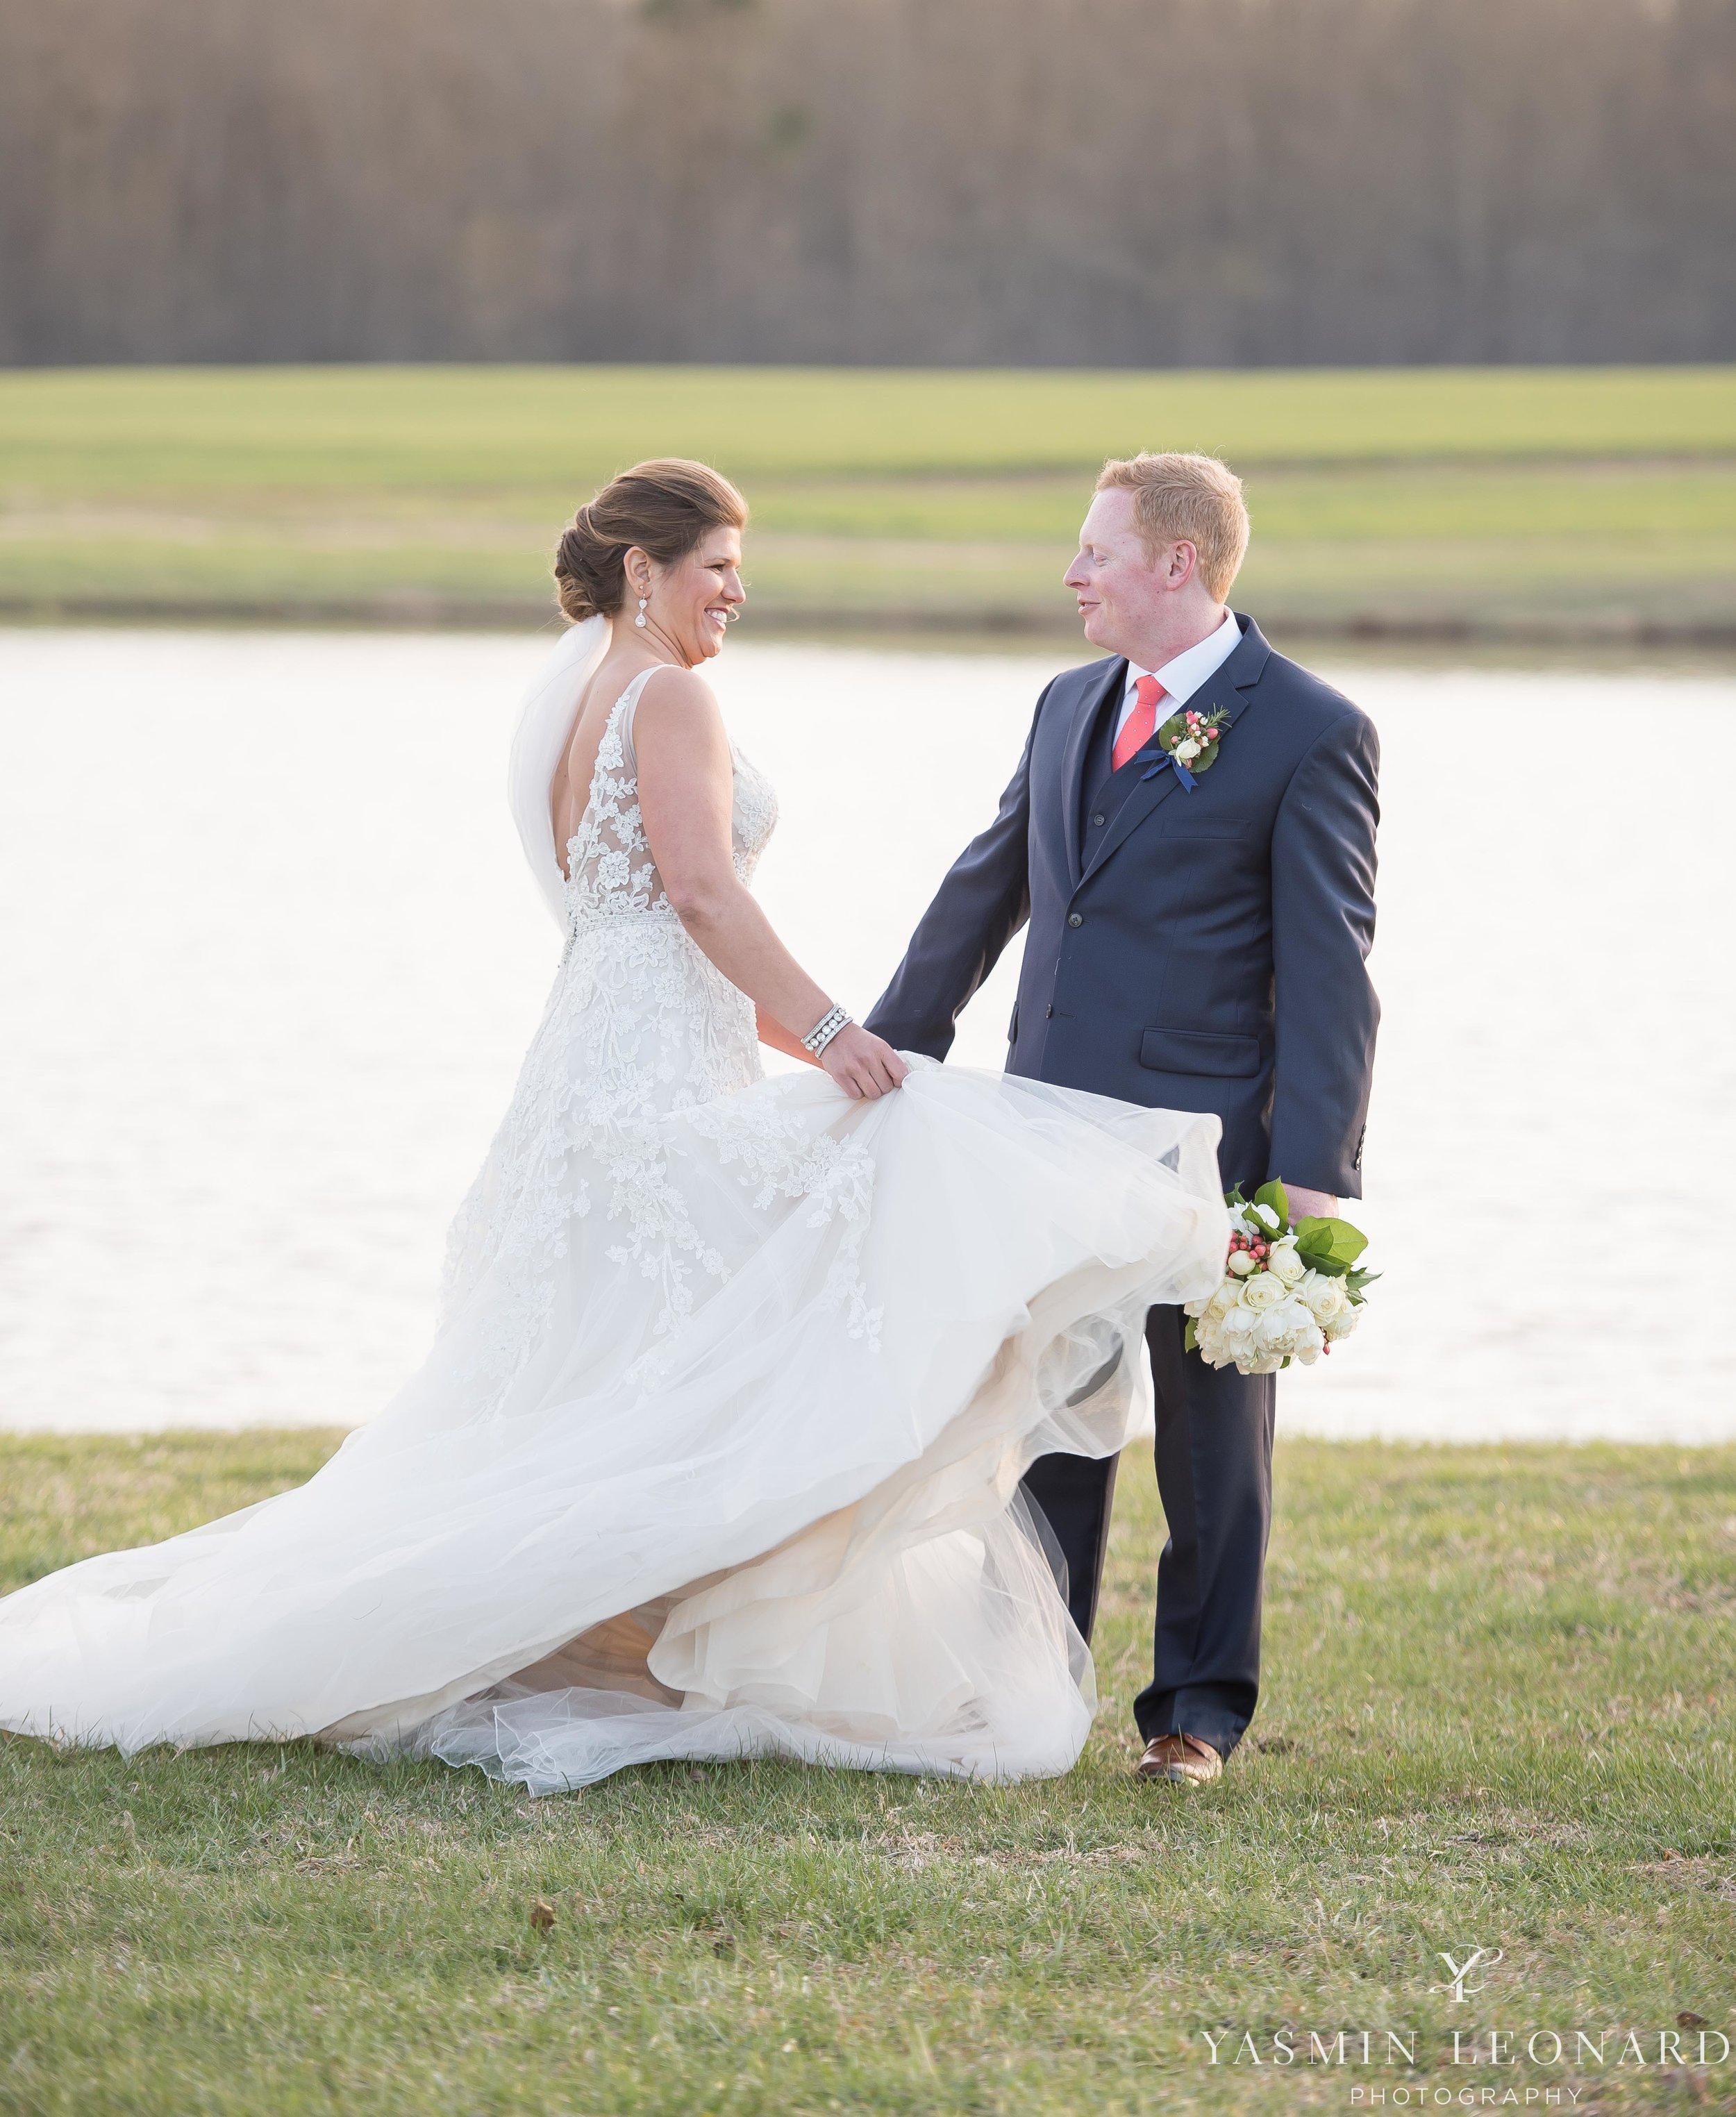 Adaumont Farm - Adaumont Farm Weddings - Trinity Weddings - NC Weddings - Yasmin Leonard Photography-46.jpg